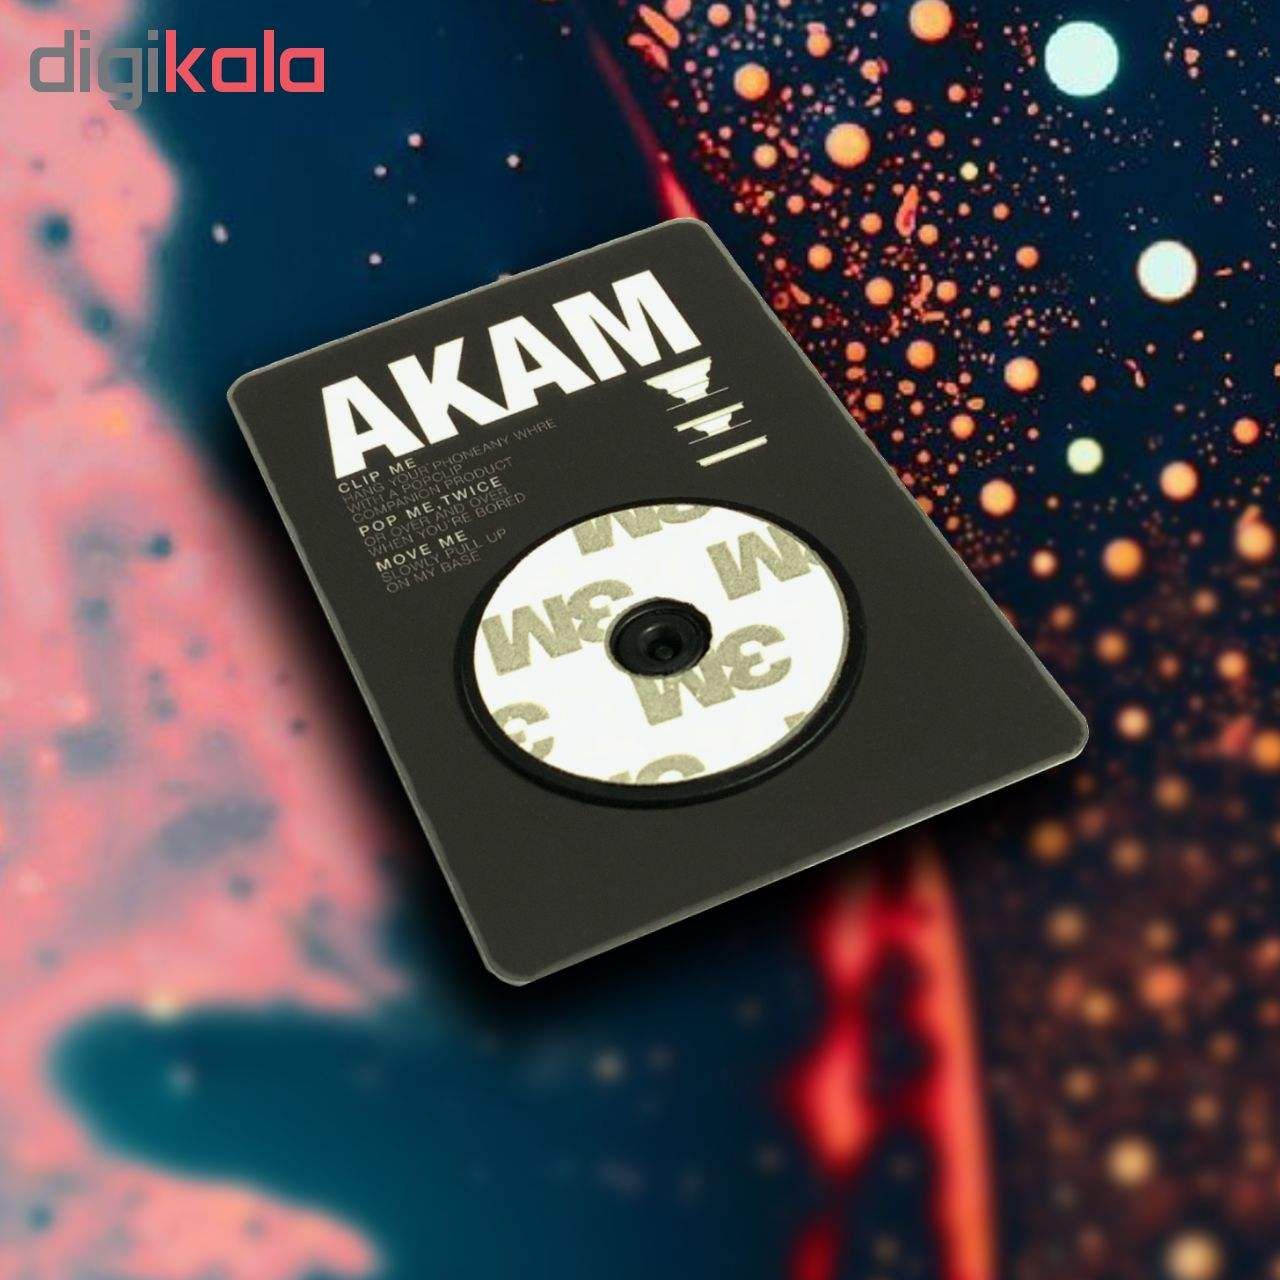 پایه نگهدارنده گوشی موبایل پاپ سوکت آکام مدل APS0293 main 1 3